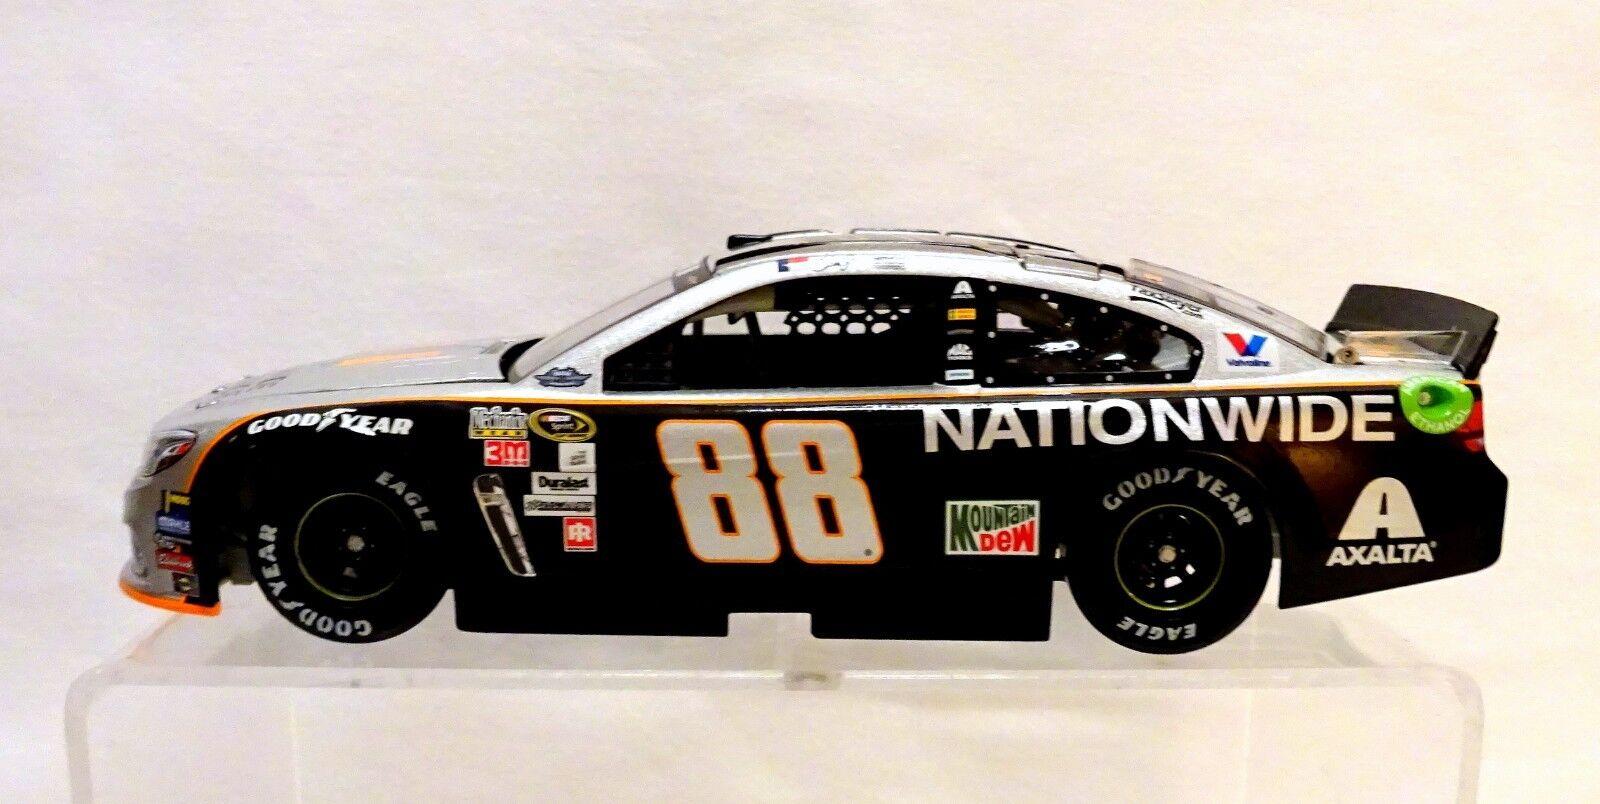 2016 1 24 Dale Earnhardt Jr   88 Nationwide Darlington Chevy 1 of 3,325   (20)